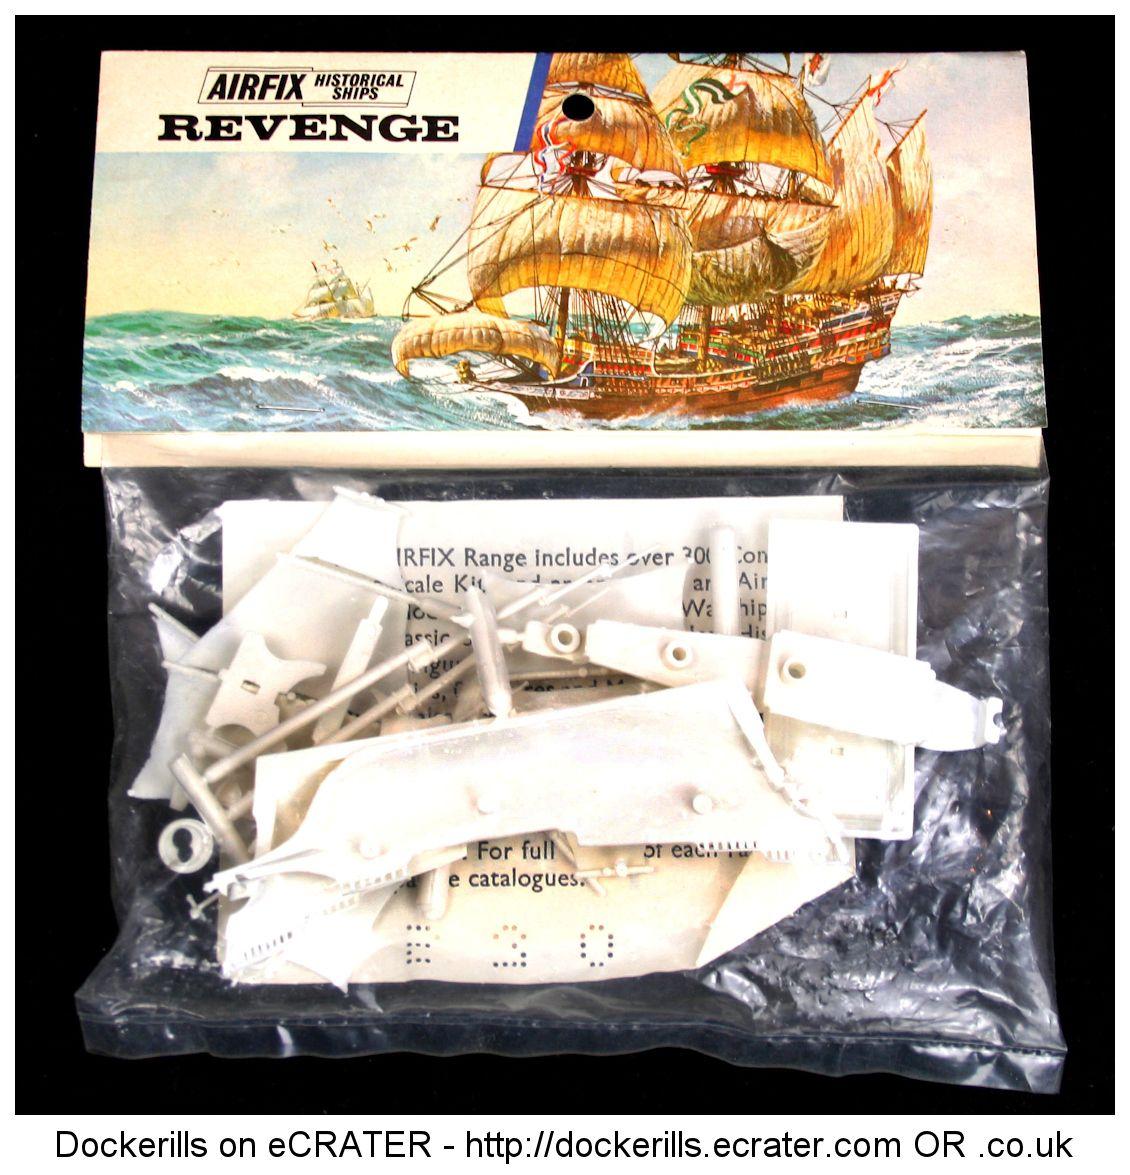 Airfix Revenge Vintage Type 3 Blue Stripe Bag Kit With Images